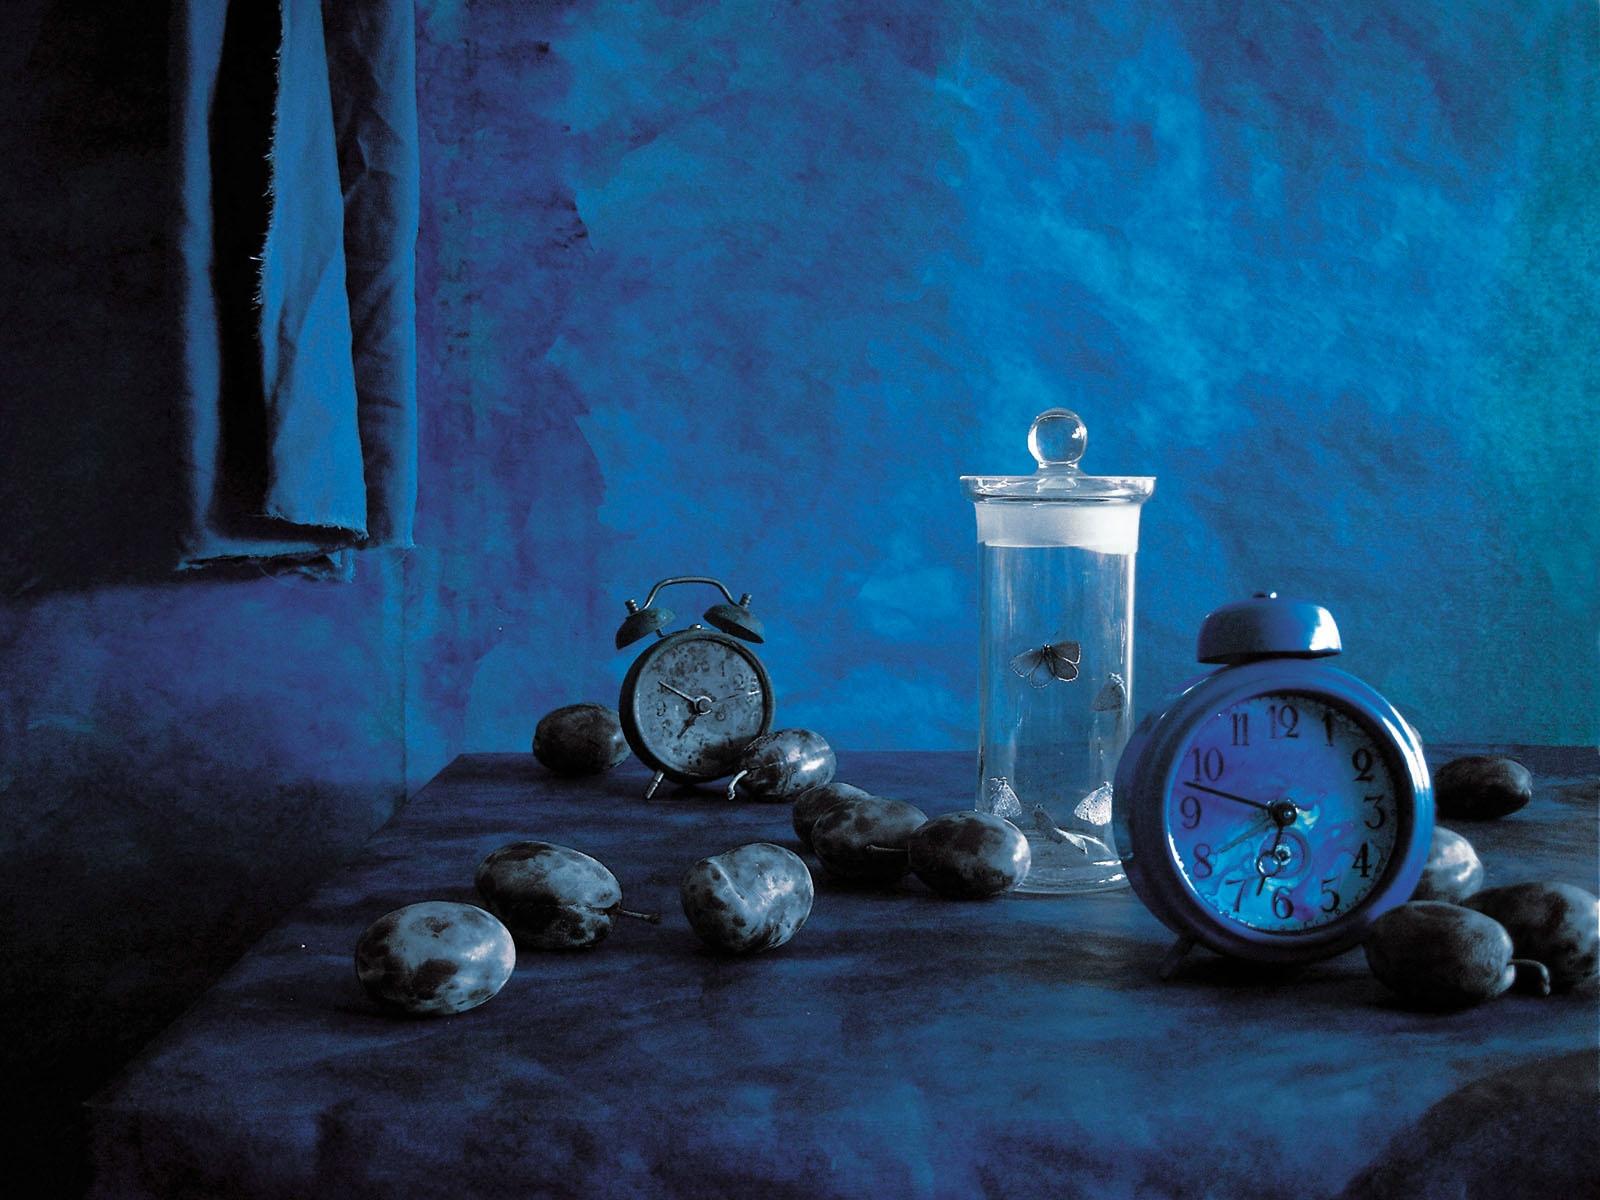 Digital Clock Wallpaper Download   Wallpaper HD Wide 1600x1200